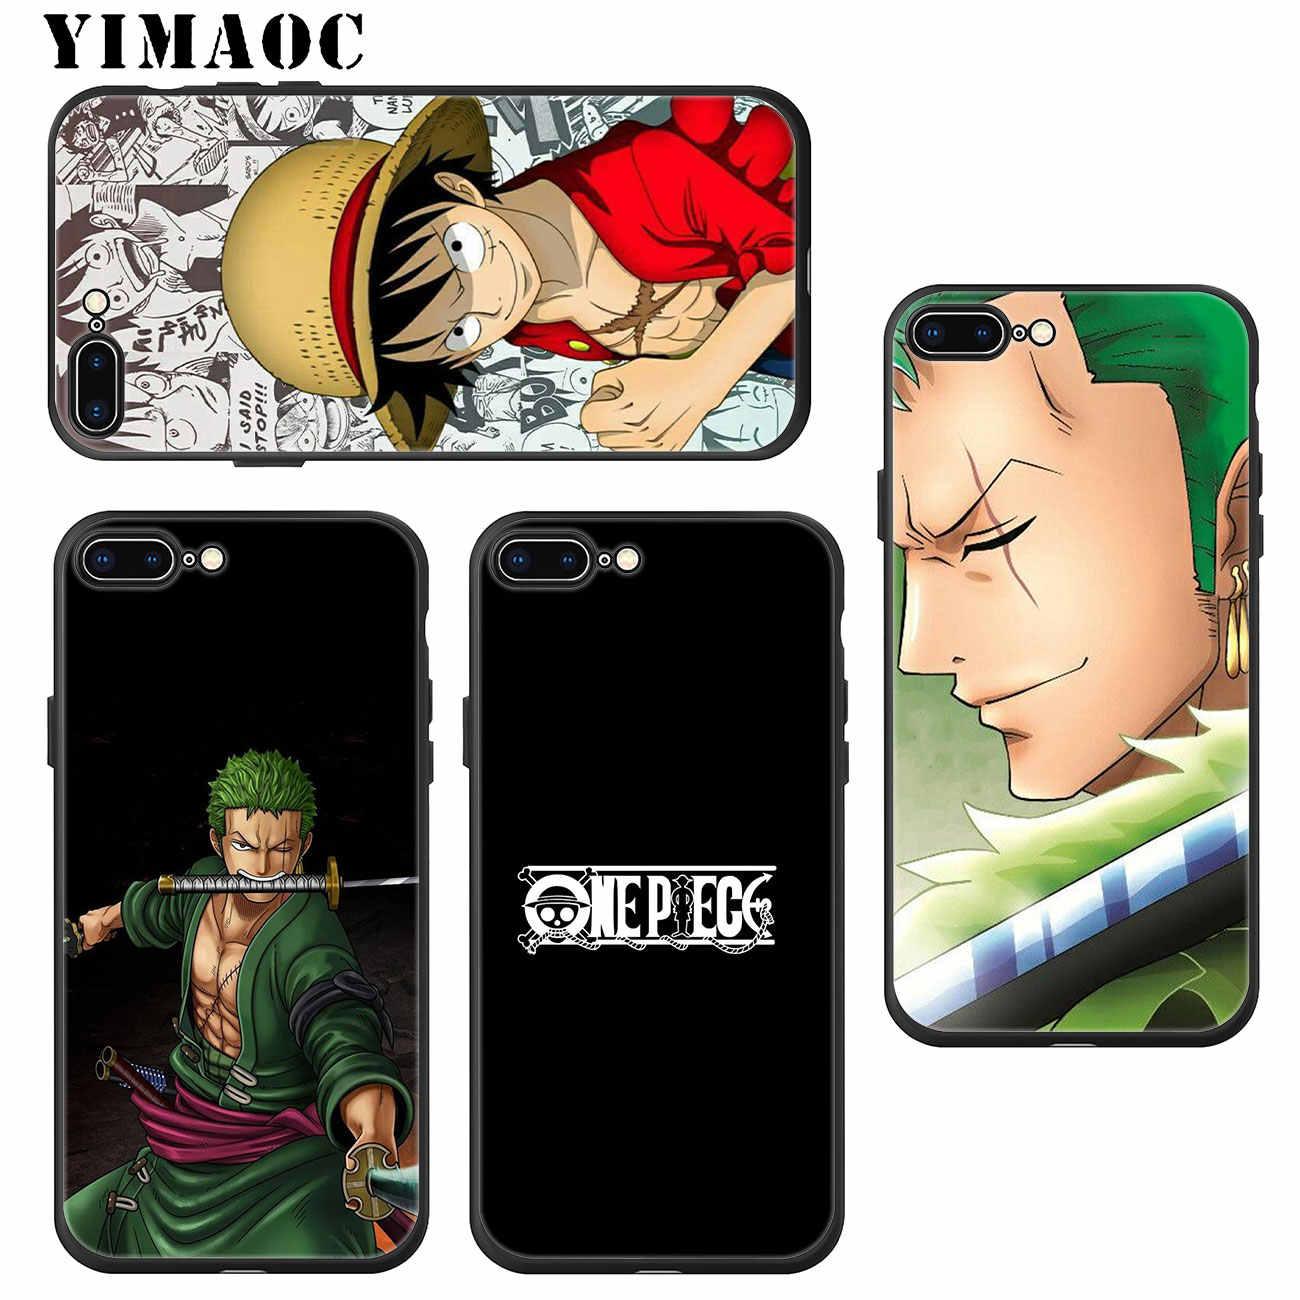 YIMAOC ZORO one piece Monkey D Luffy Мягкий силиконовый чехол для телефона iPhone XS Max XR X 6 6 S 7 8 Plus 5 5S SE 10 TPU черный чехол